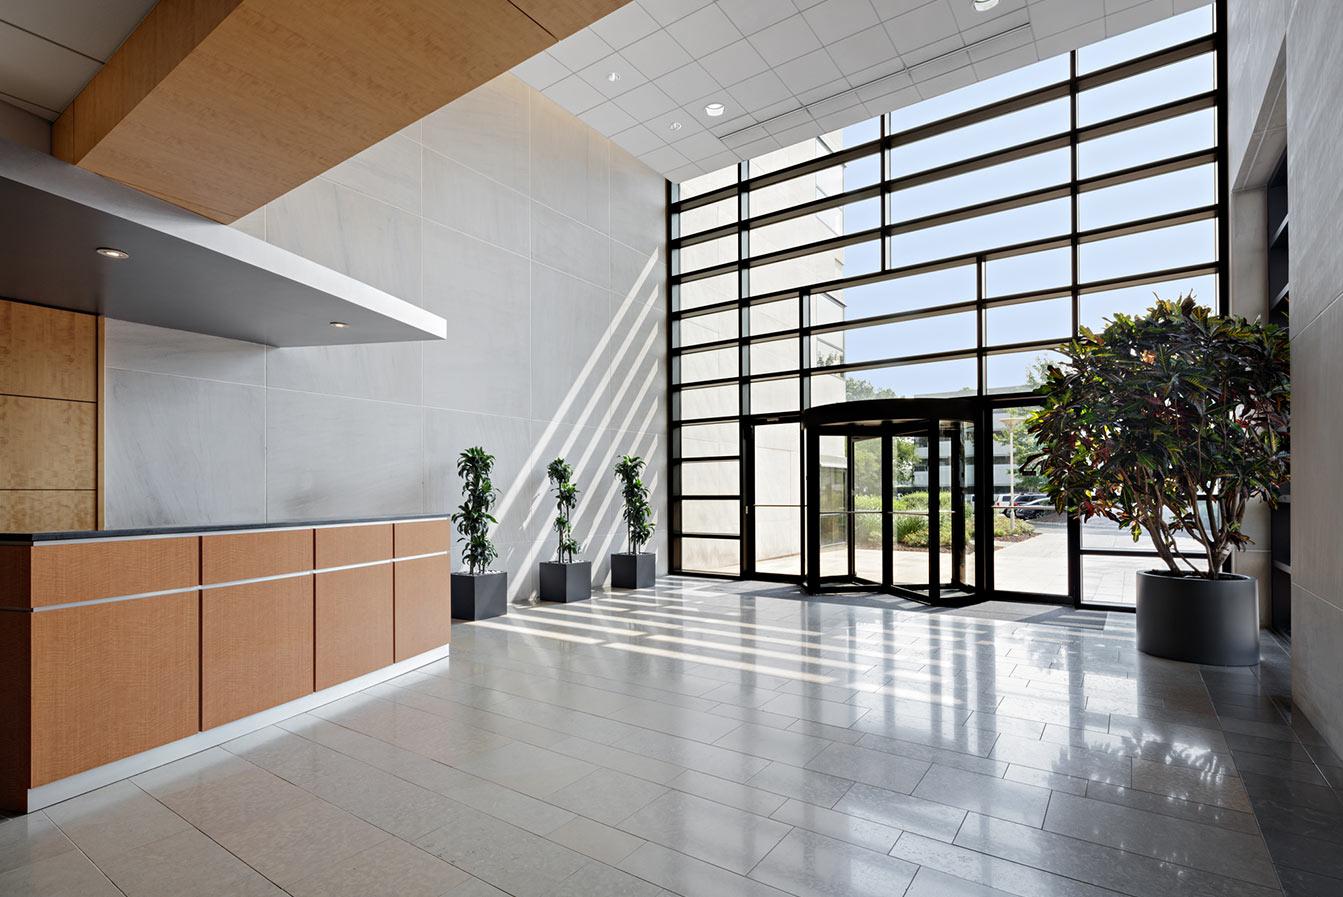 101 JFK parkway interior entrance